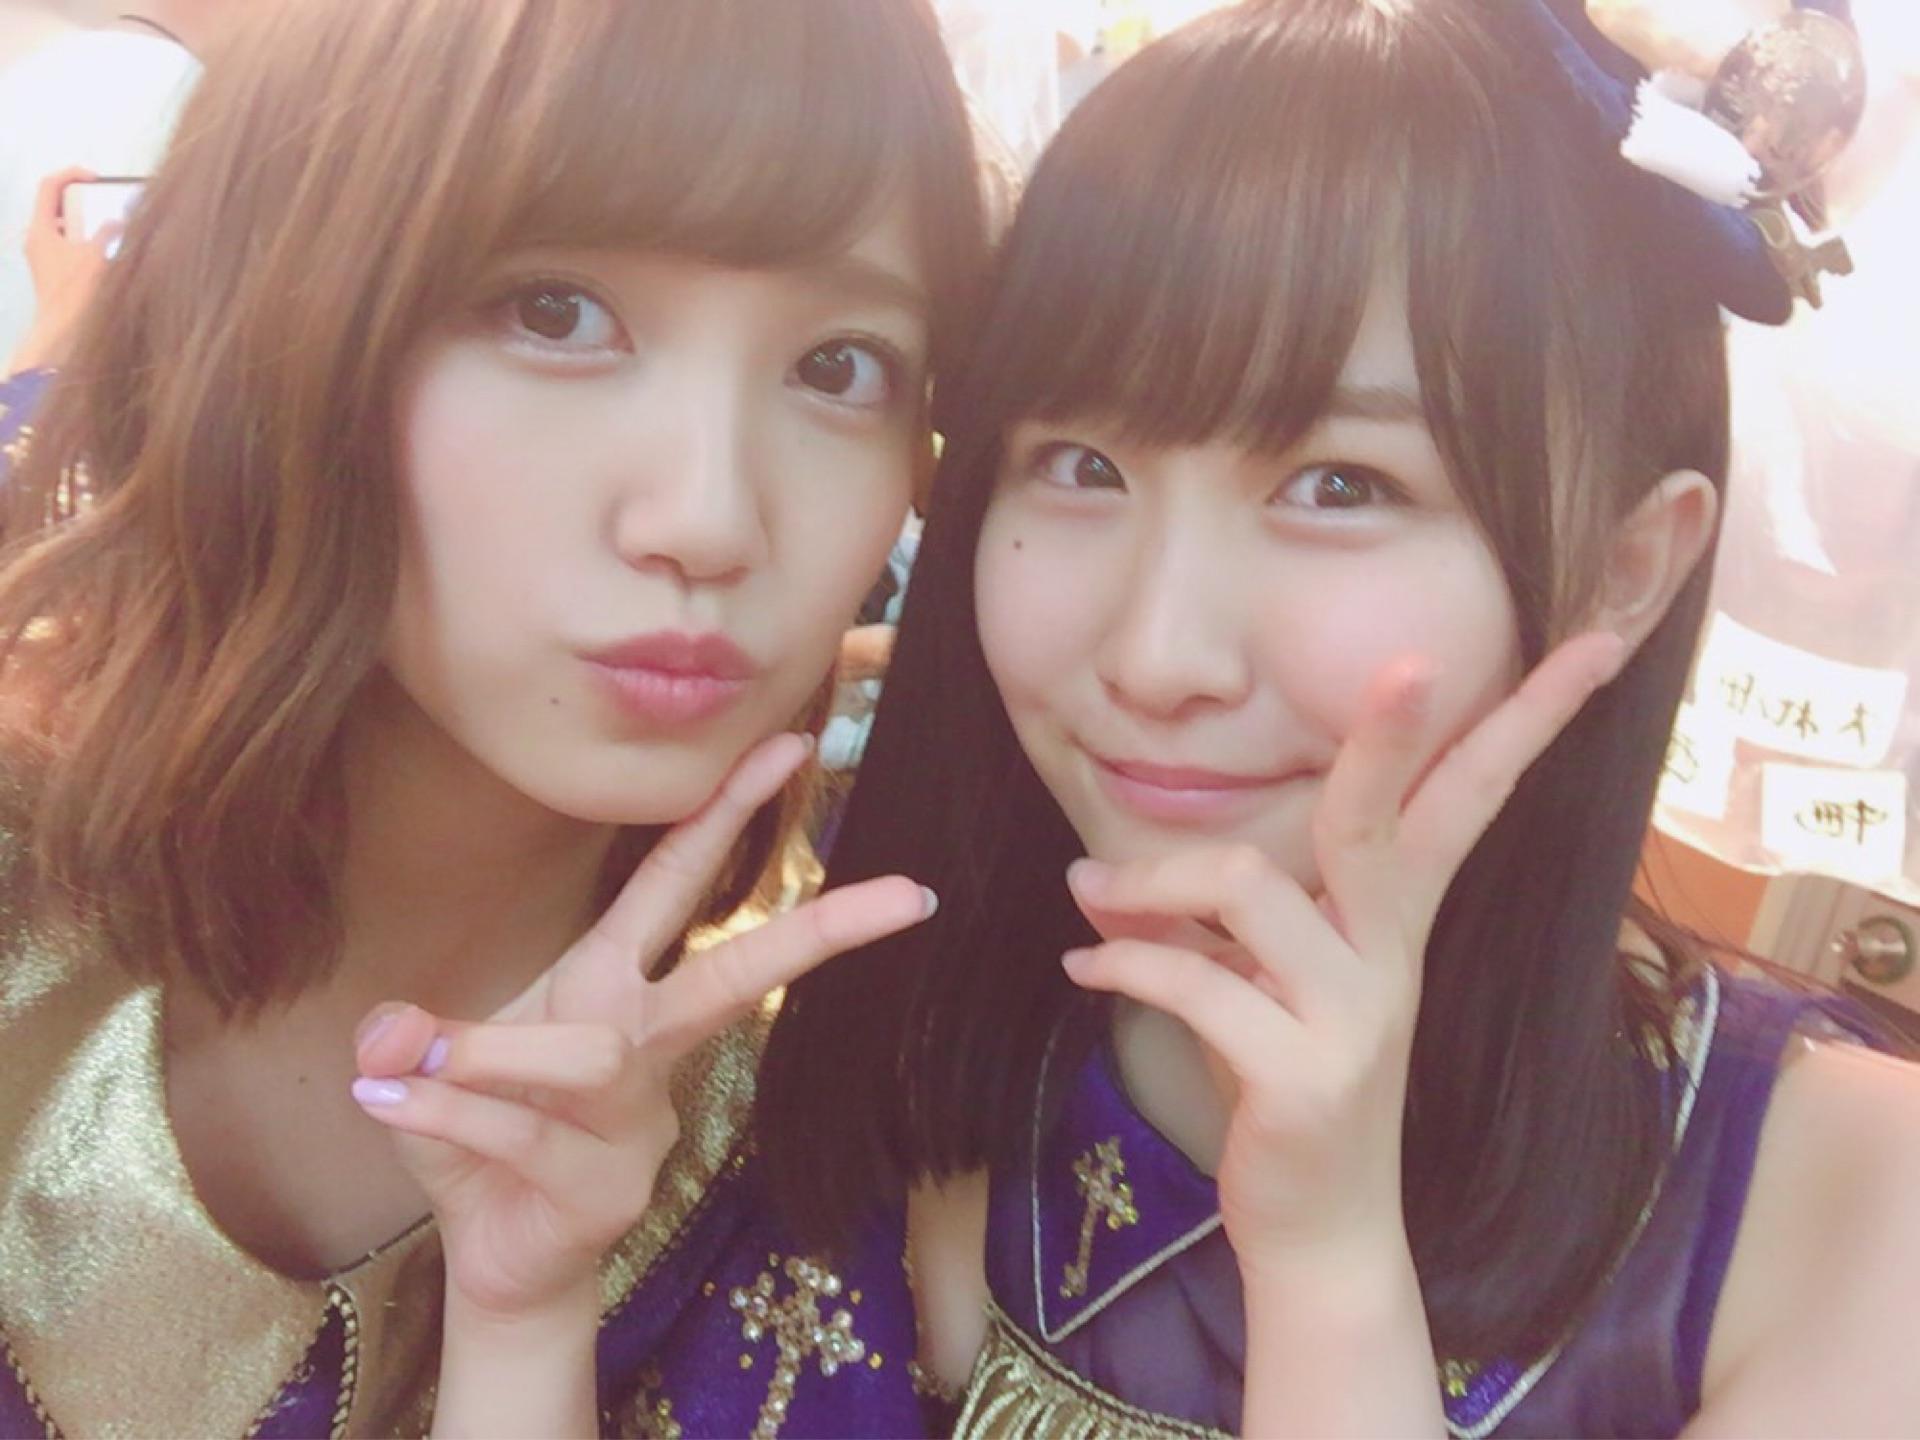 【AKB48 】加藤玲奈☆応援スレ84【れなっち】©2ch.netYouTube動画>12本 ->画像>1617枚